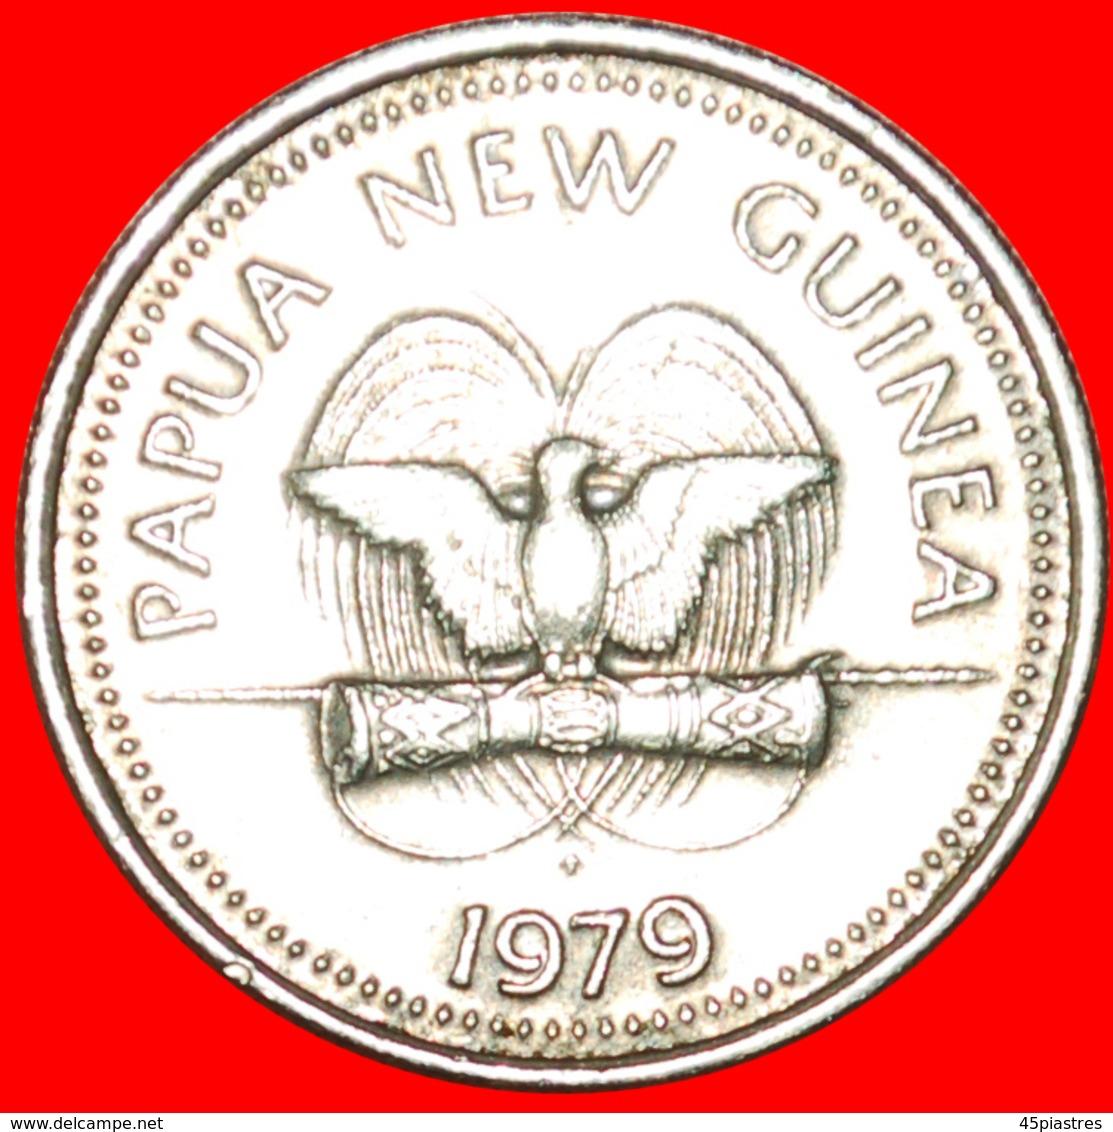 + USA TURTLE: PAPUA NEW GUINEA ★ 5 TOEA 1979FM UNCOMMON! LOW START ★ NO RESERVE! - Papoea-Nieuw-Guinea